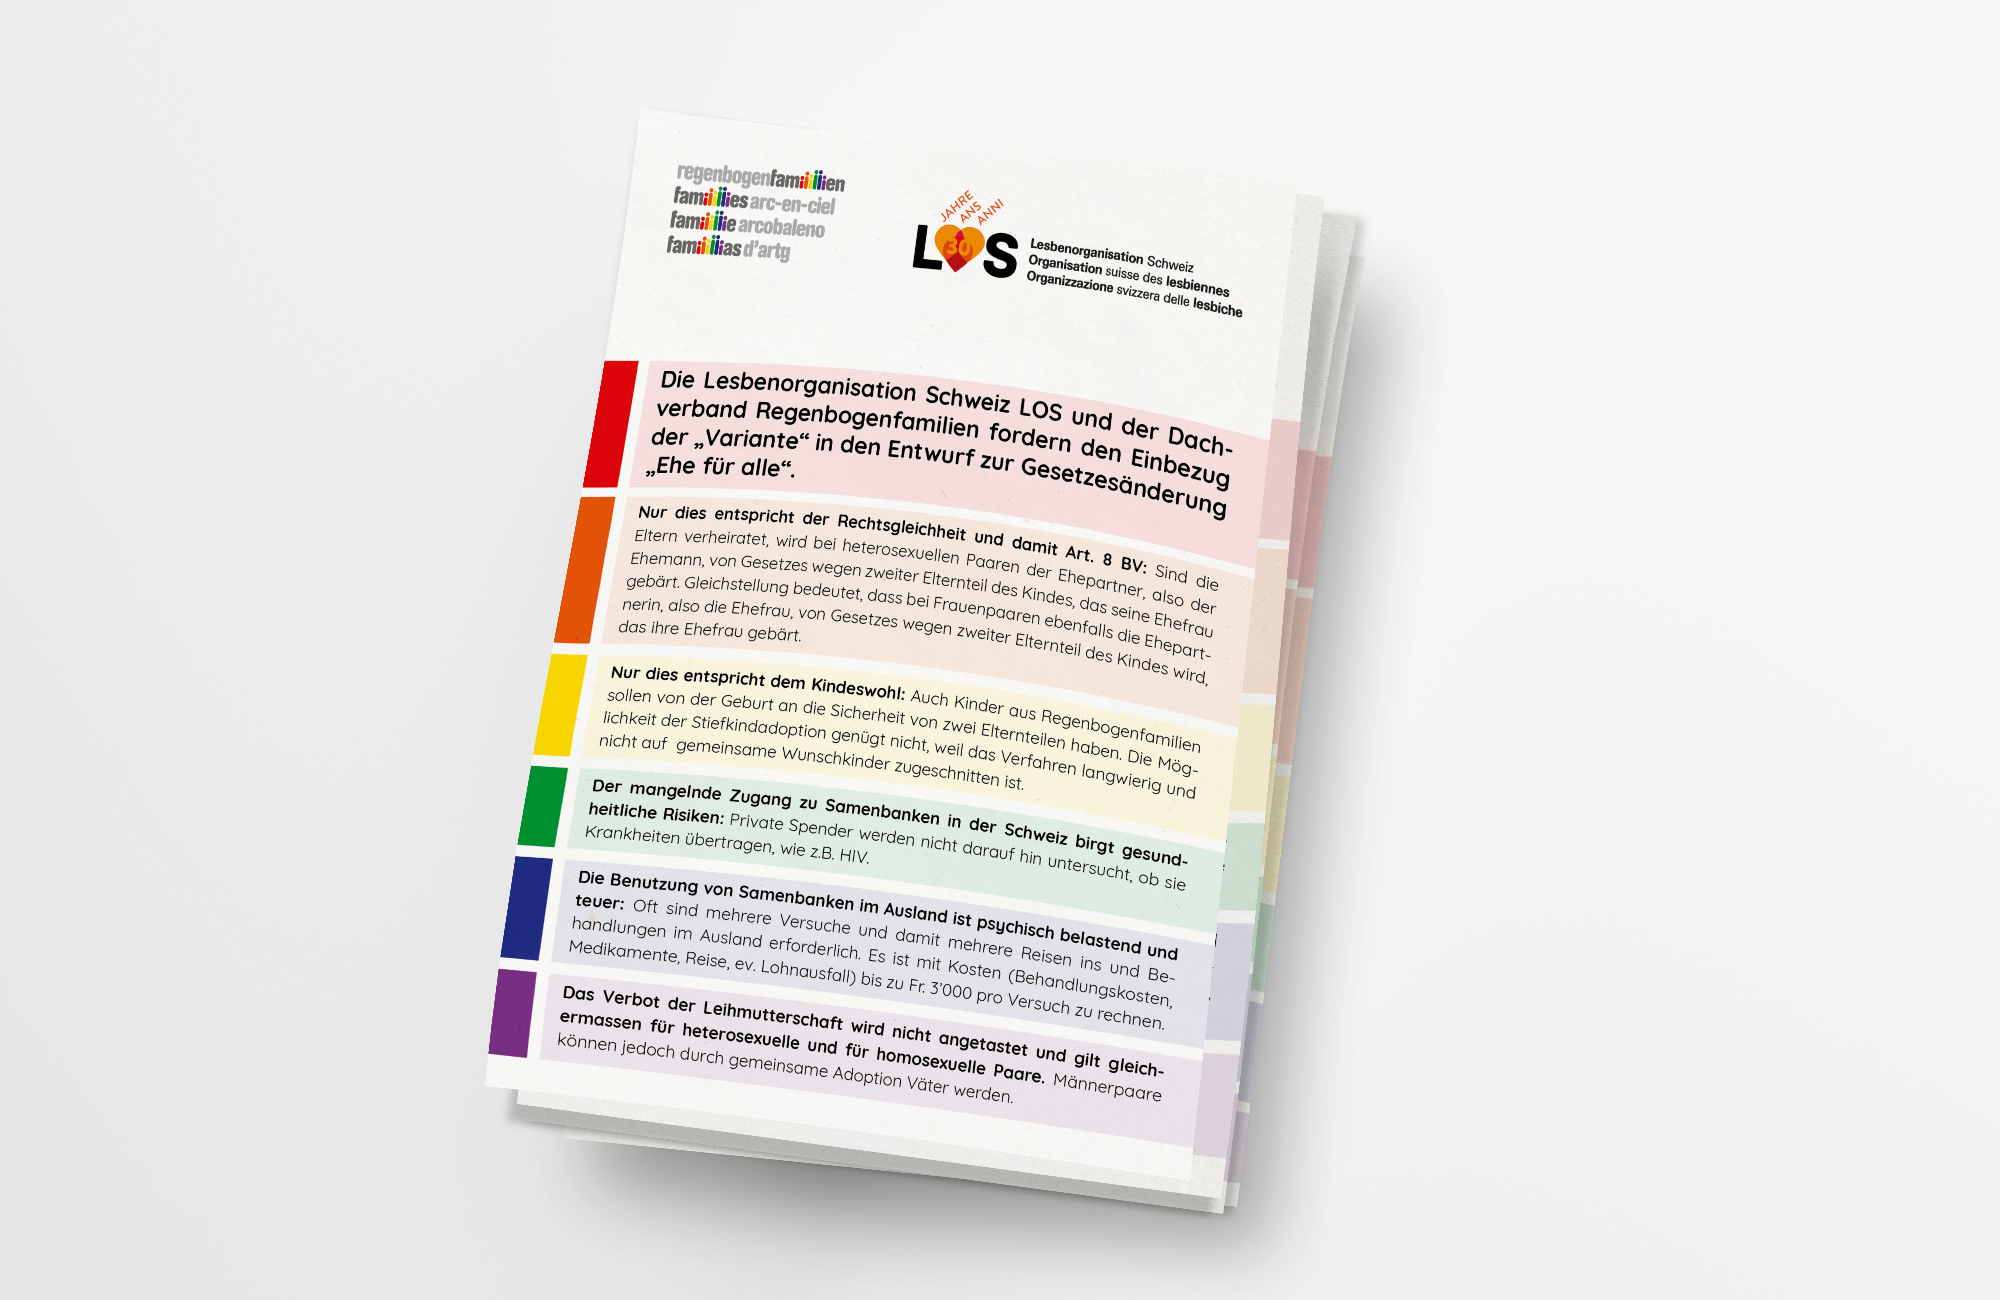 Dachverband Regenbogenfamilien | Flyer